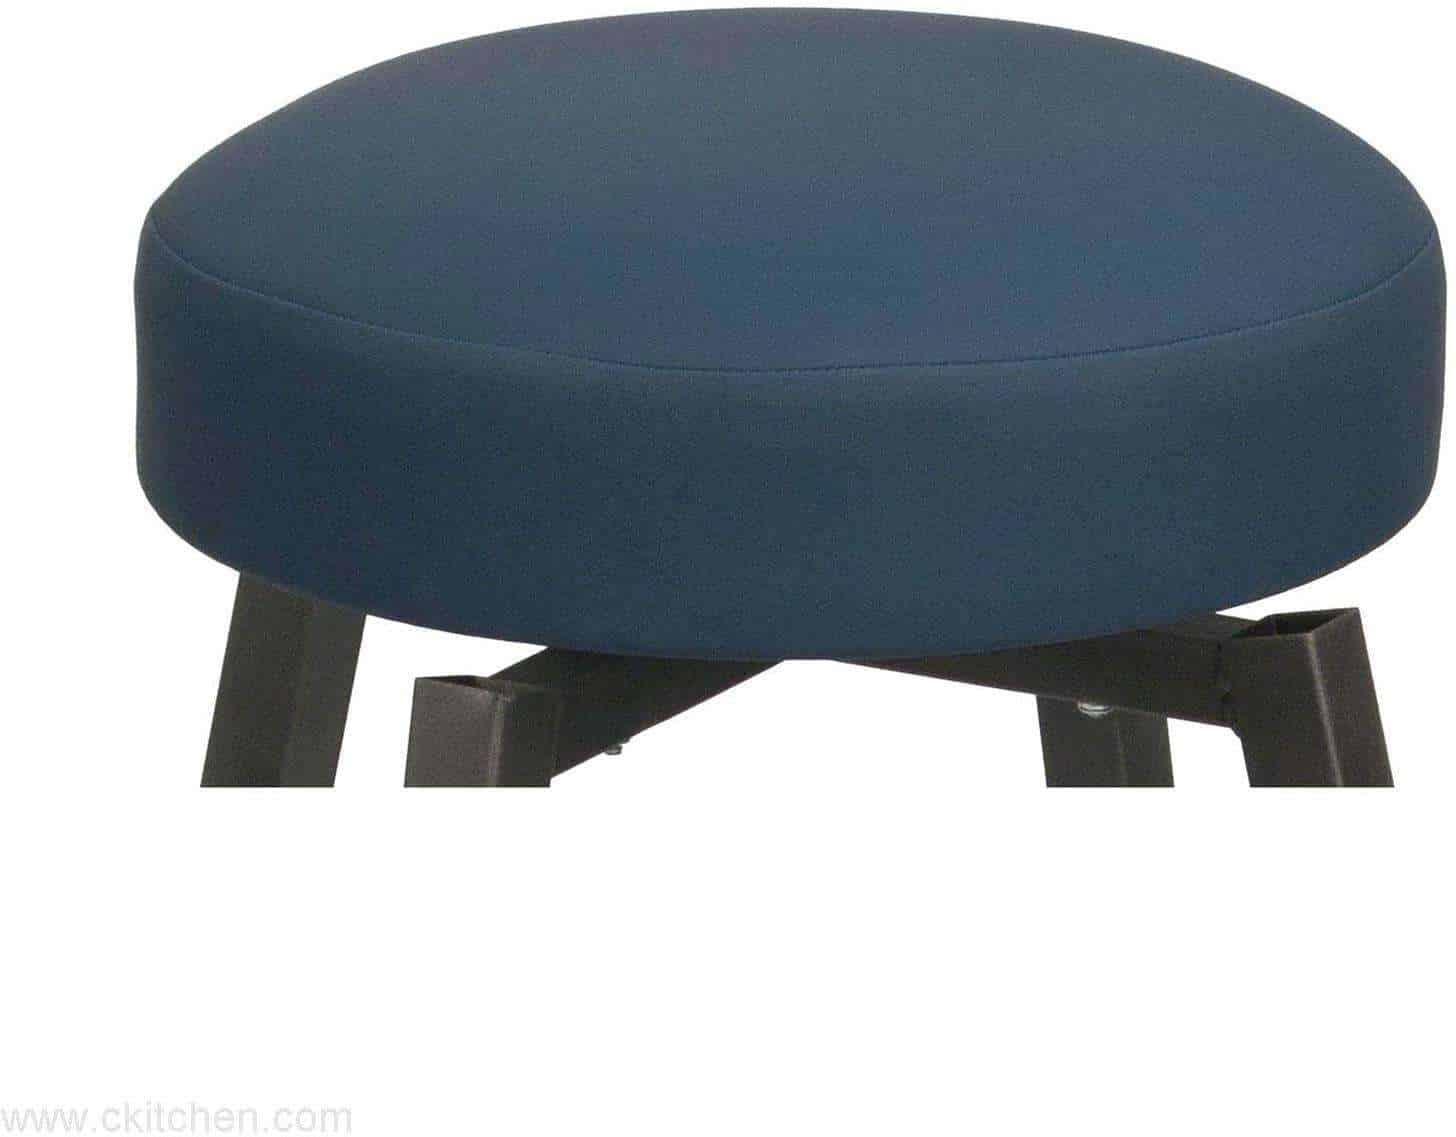 Carroll Chair C S456 GR6 56 Replacement Bar Stool Seat at  : carroll c s456 gr6 56 replacement bar stool seat from www.ckitchen.com size 1456 x 1137 jpeg 91kB